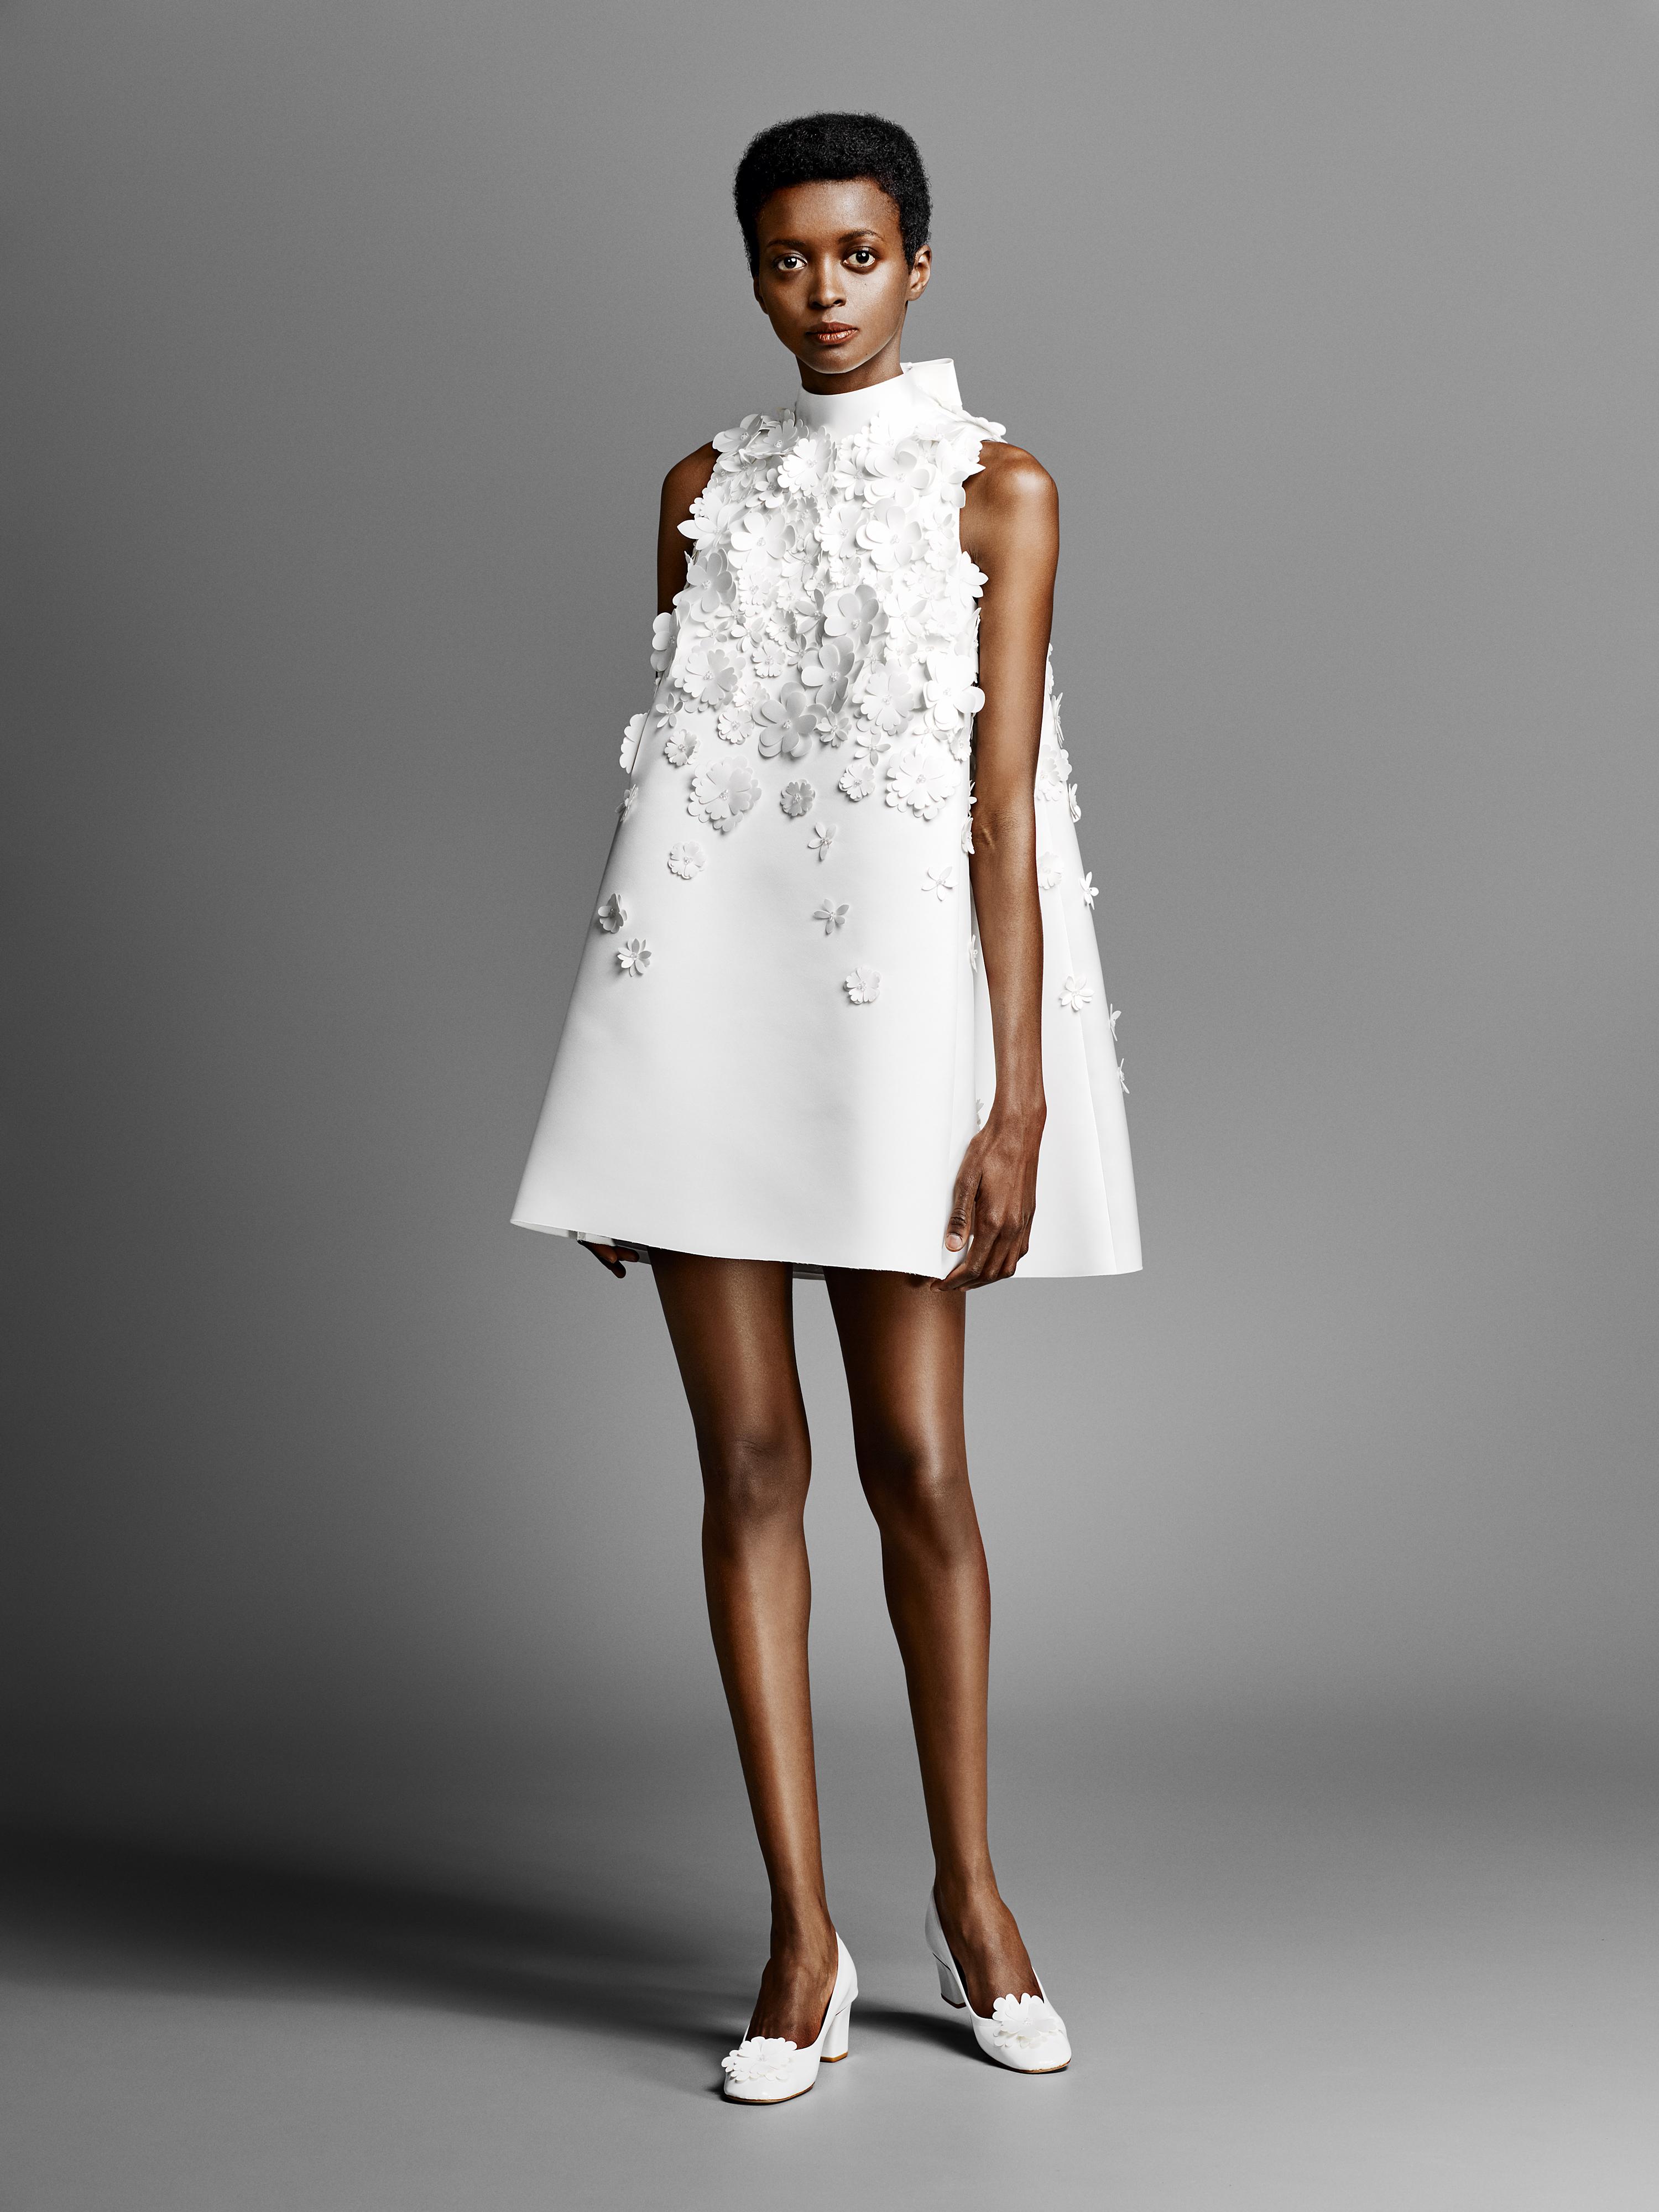 short viktor rolf wedding dress with high neck spring 2019